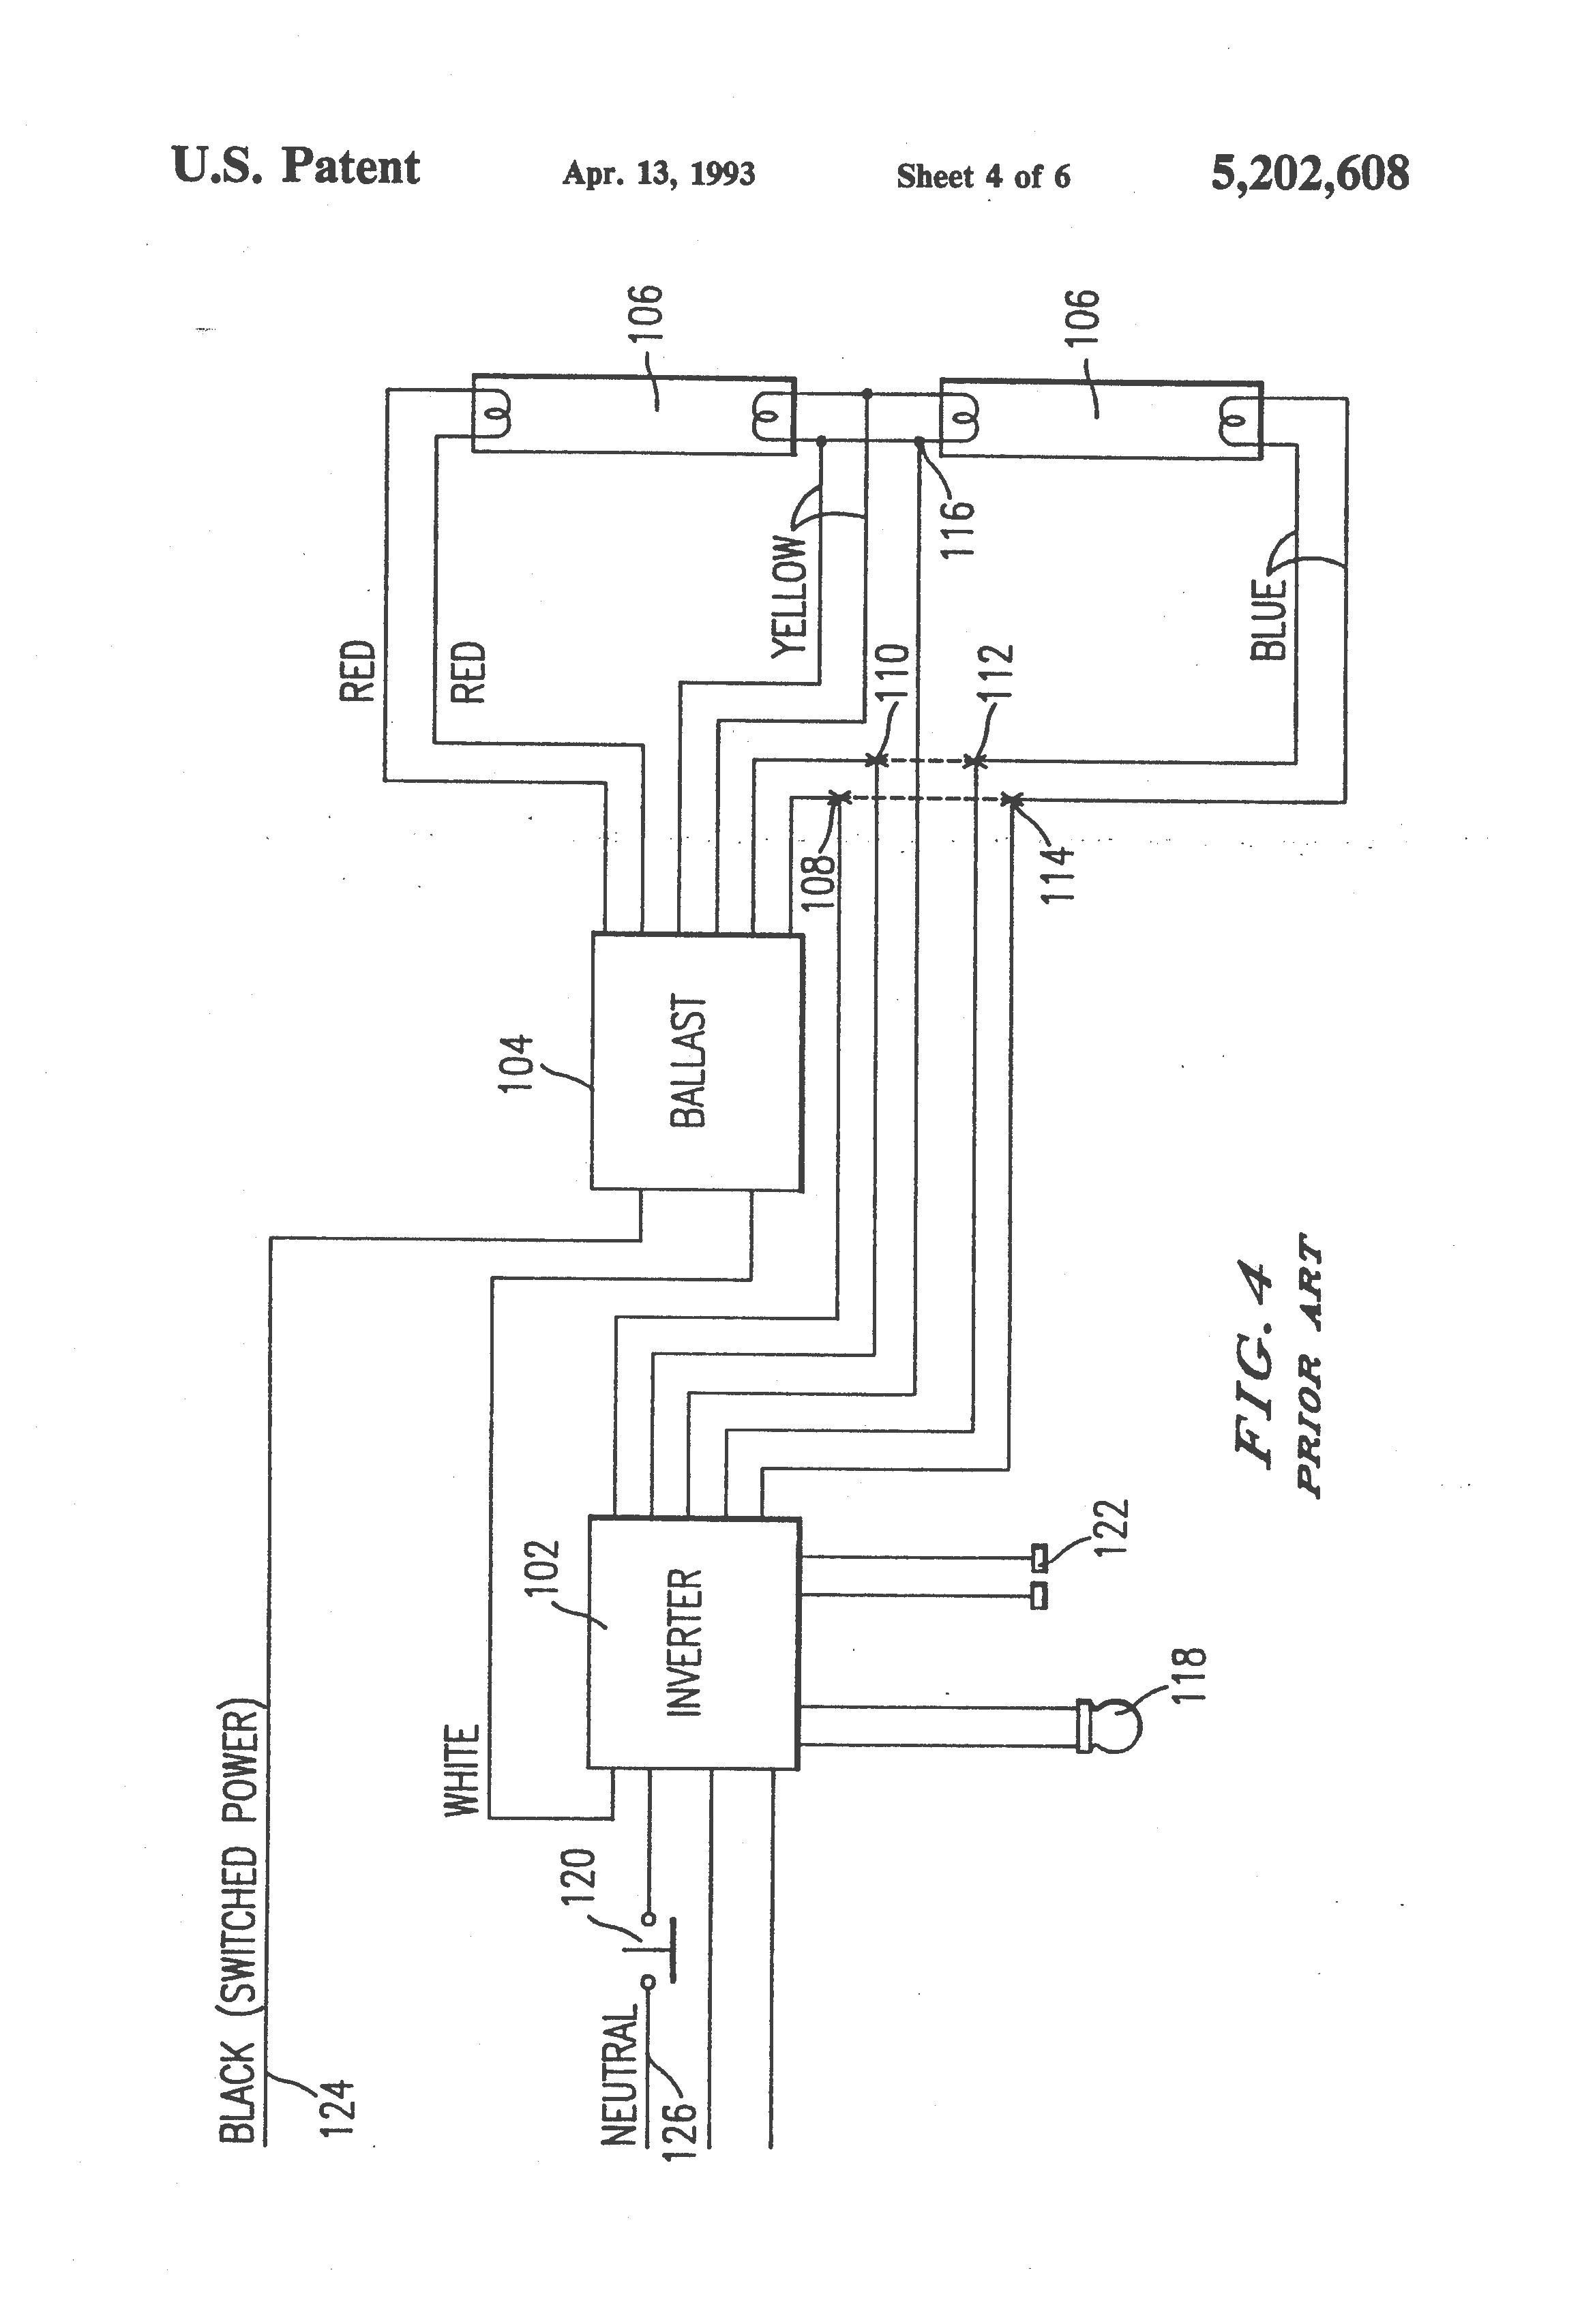 Advance Ballast Kit Wiring Diagram | Wiring Diagram - Philips Advance Ballast Wiring Diagram